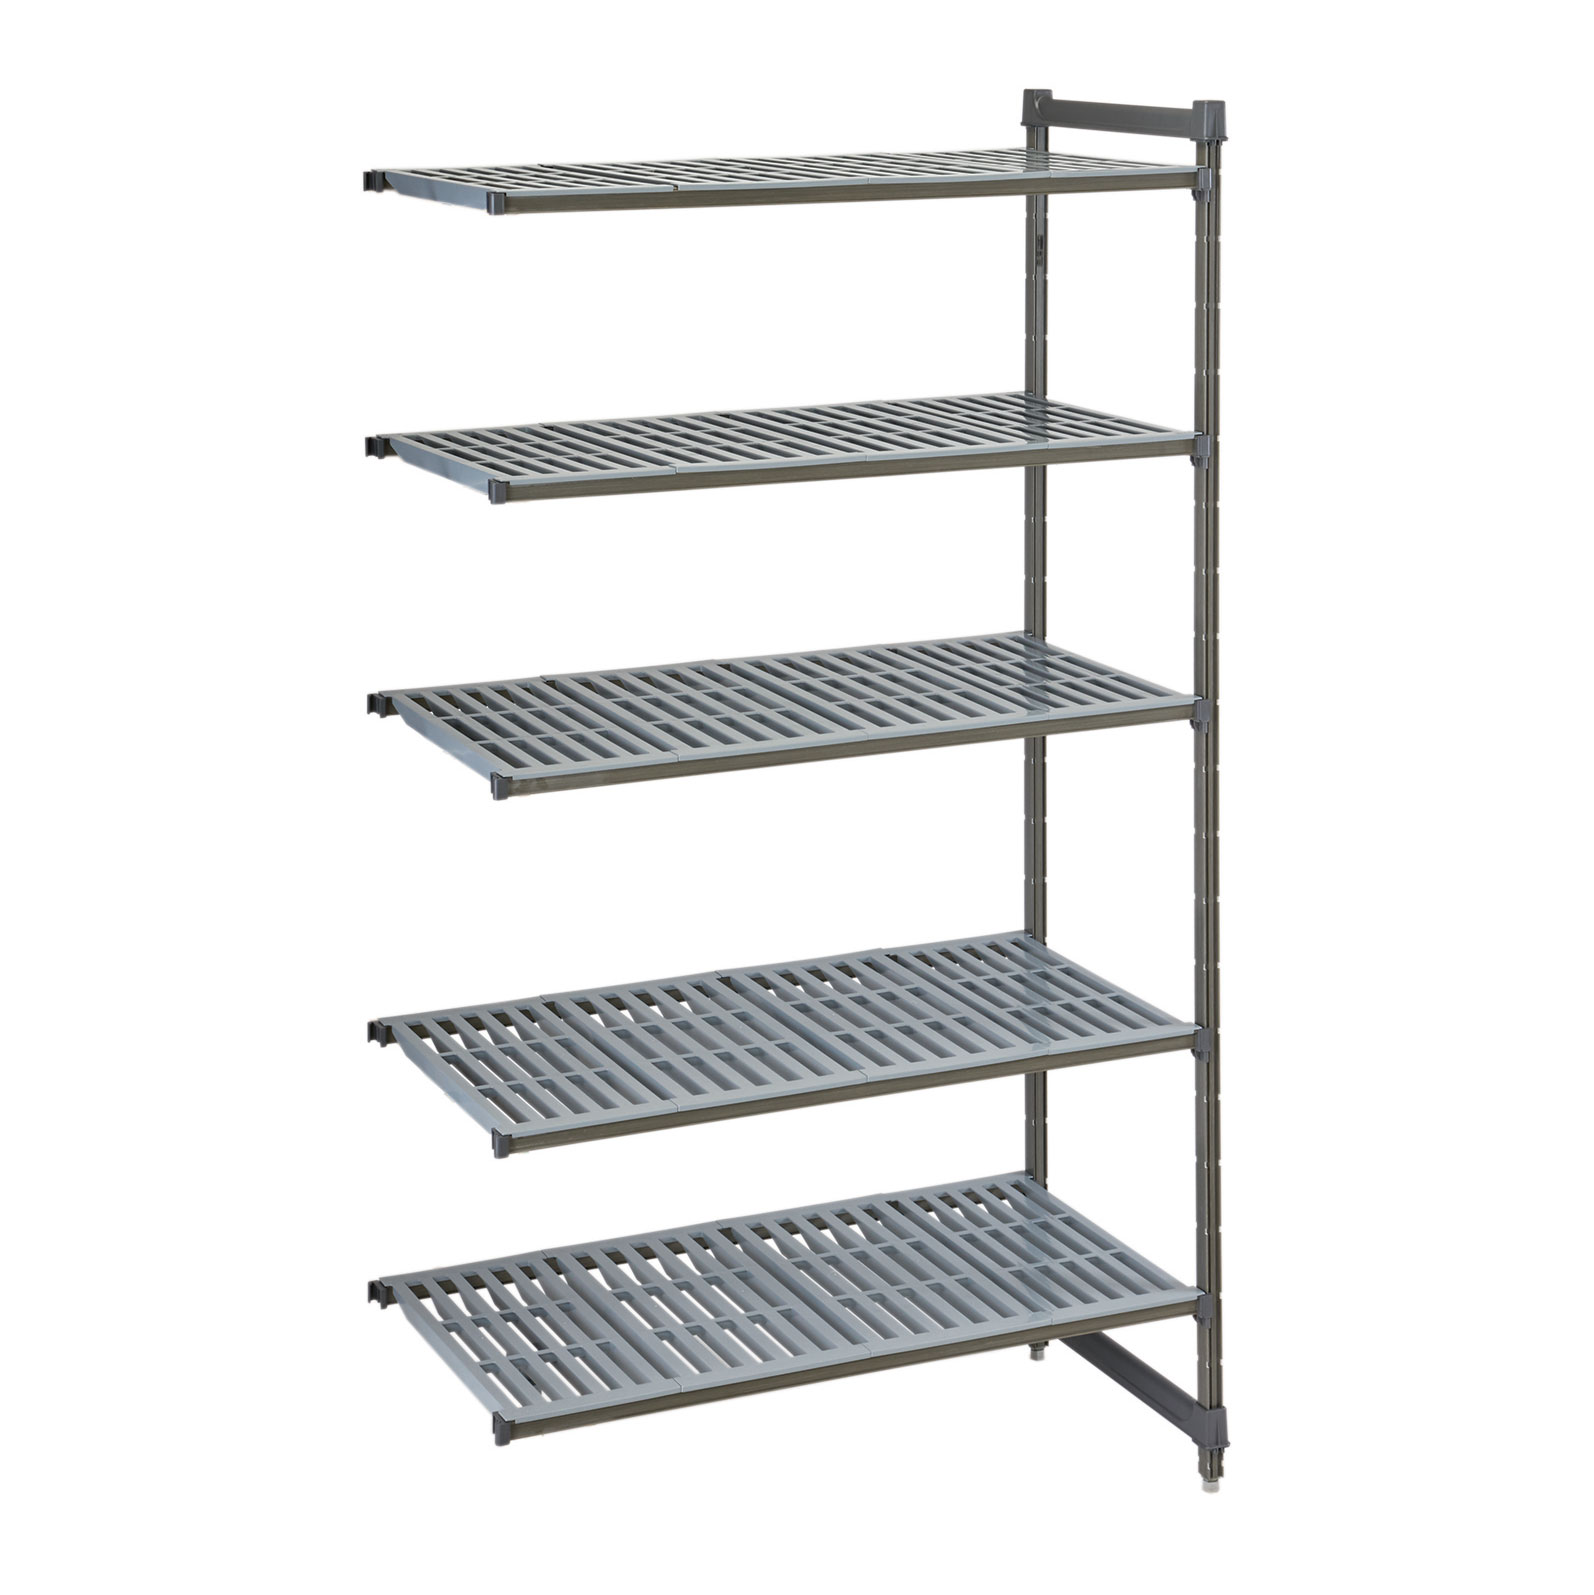 Cambro CBA183664V5580 shelving unit, all plastic